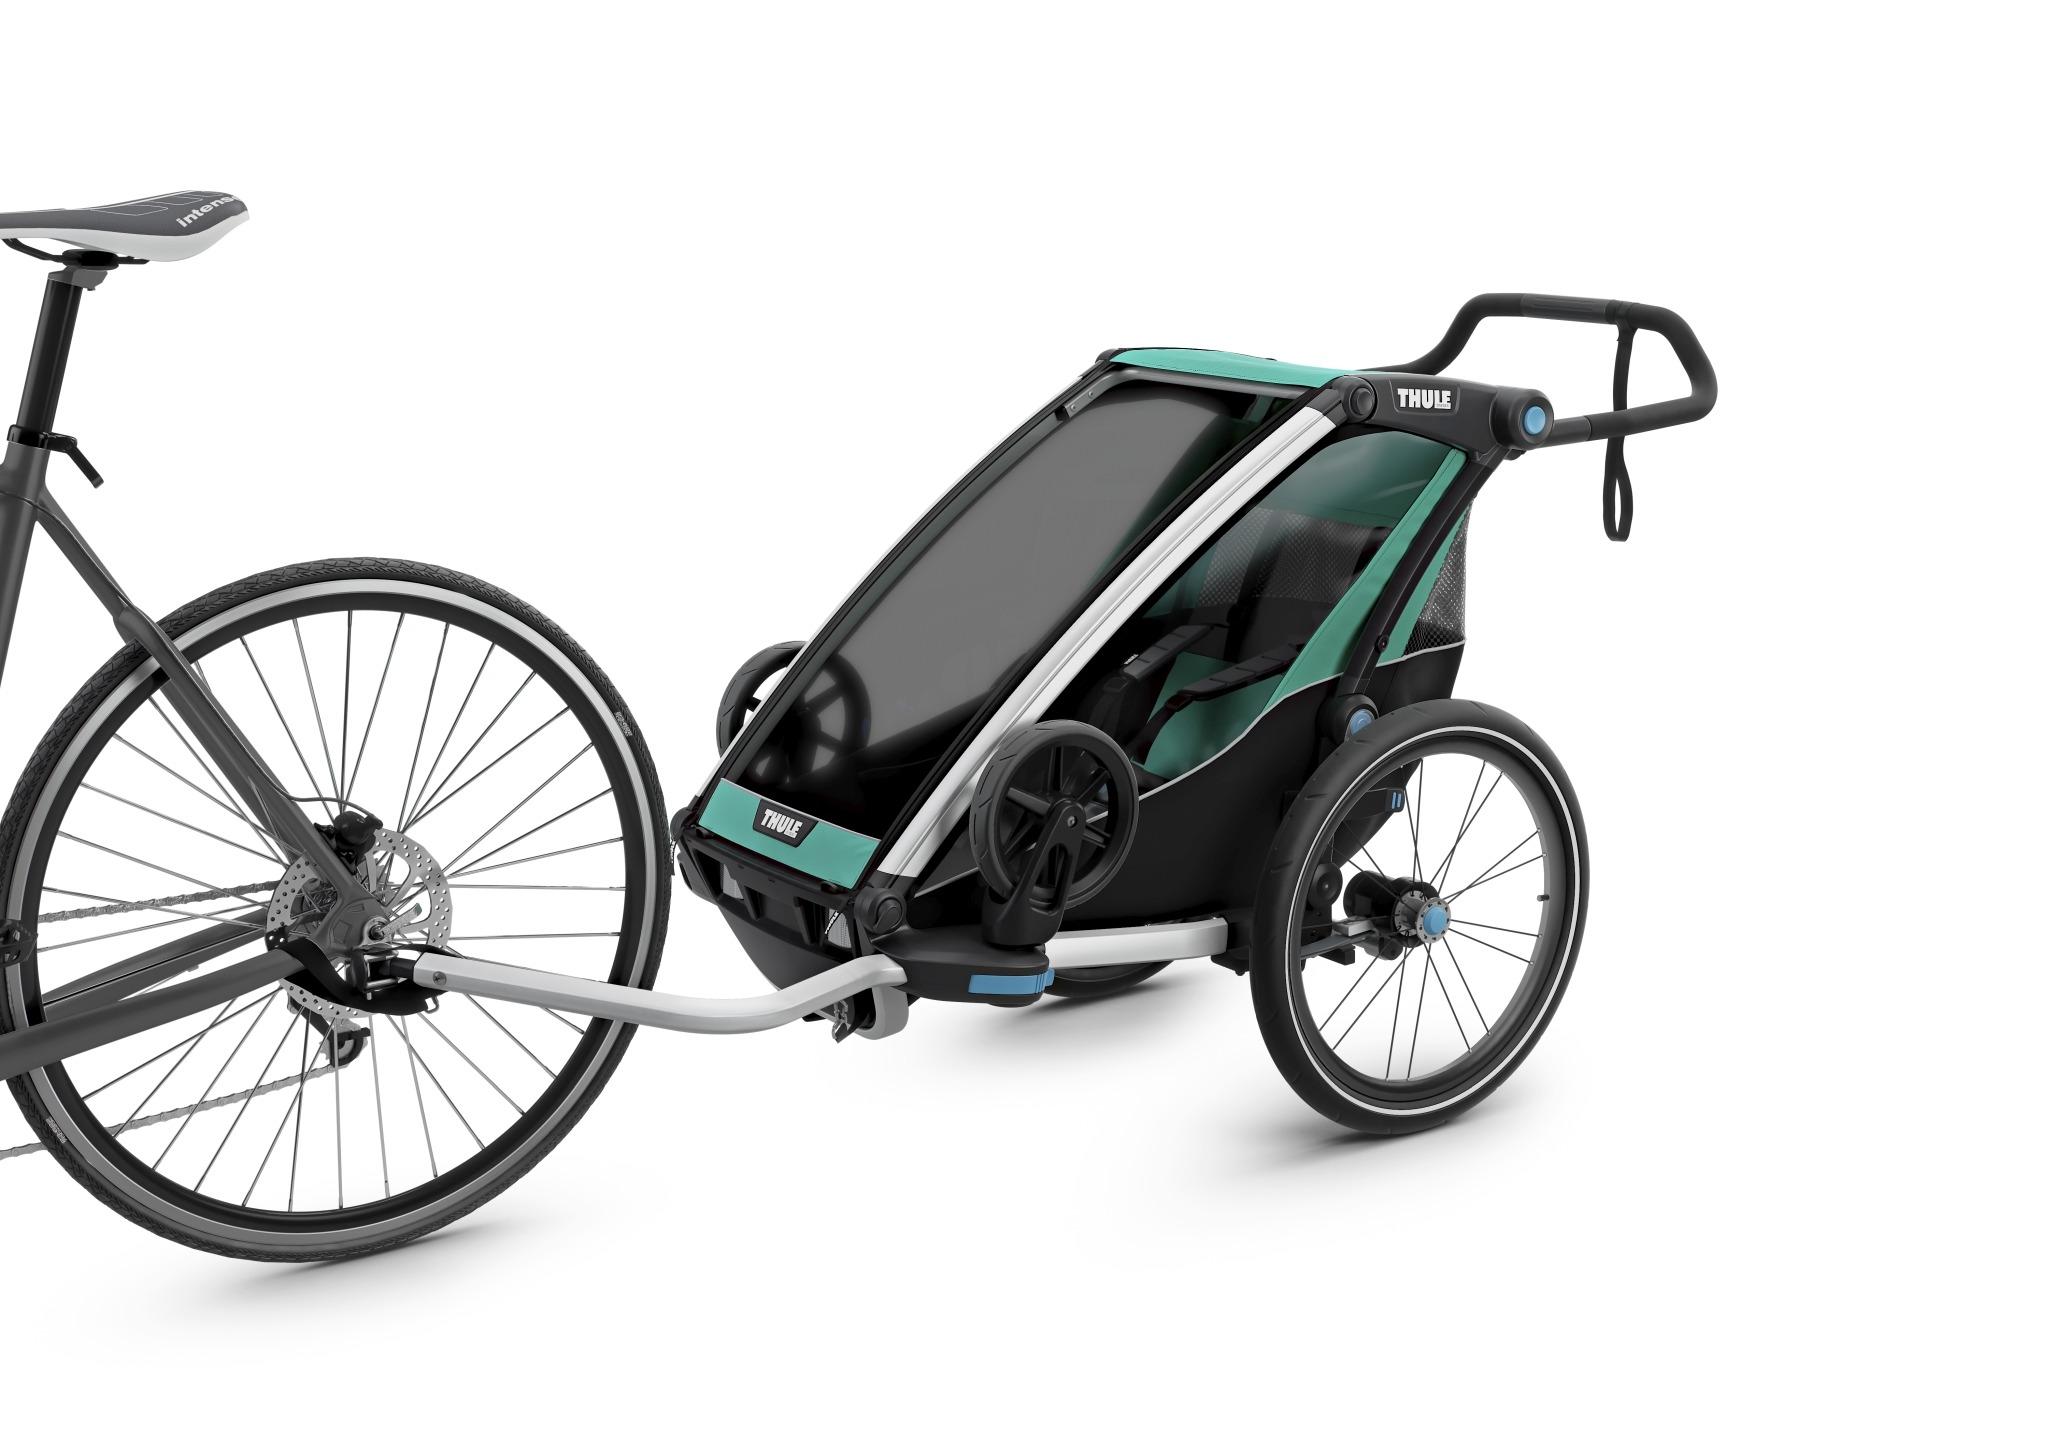 Wózek do biegania - THULE Chariot Lite 1 - morski/czarny